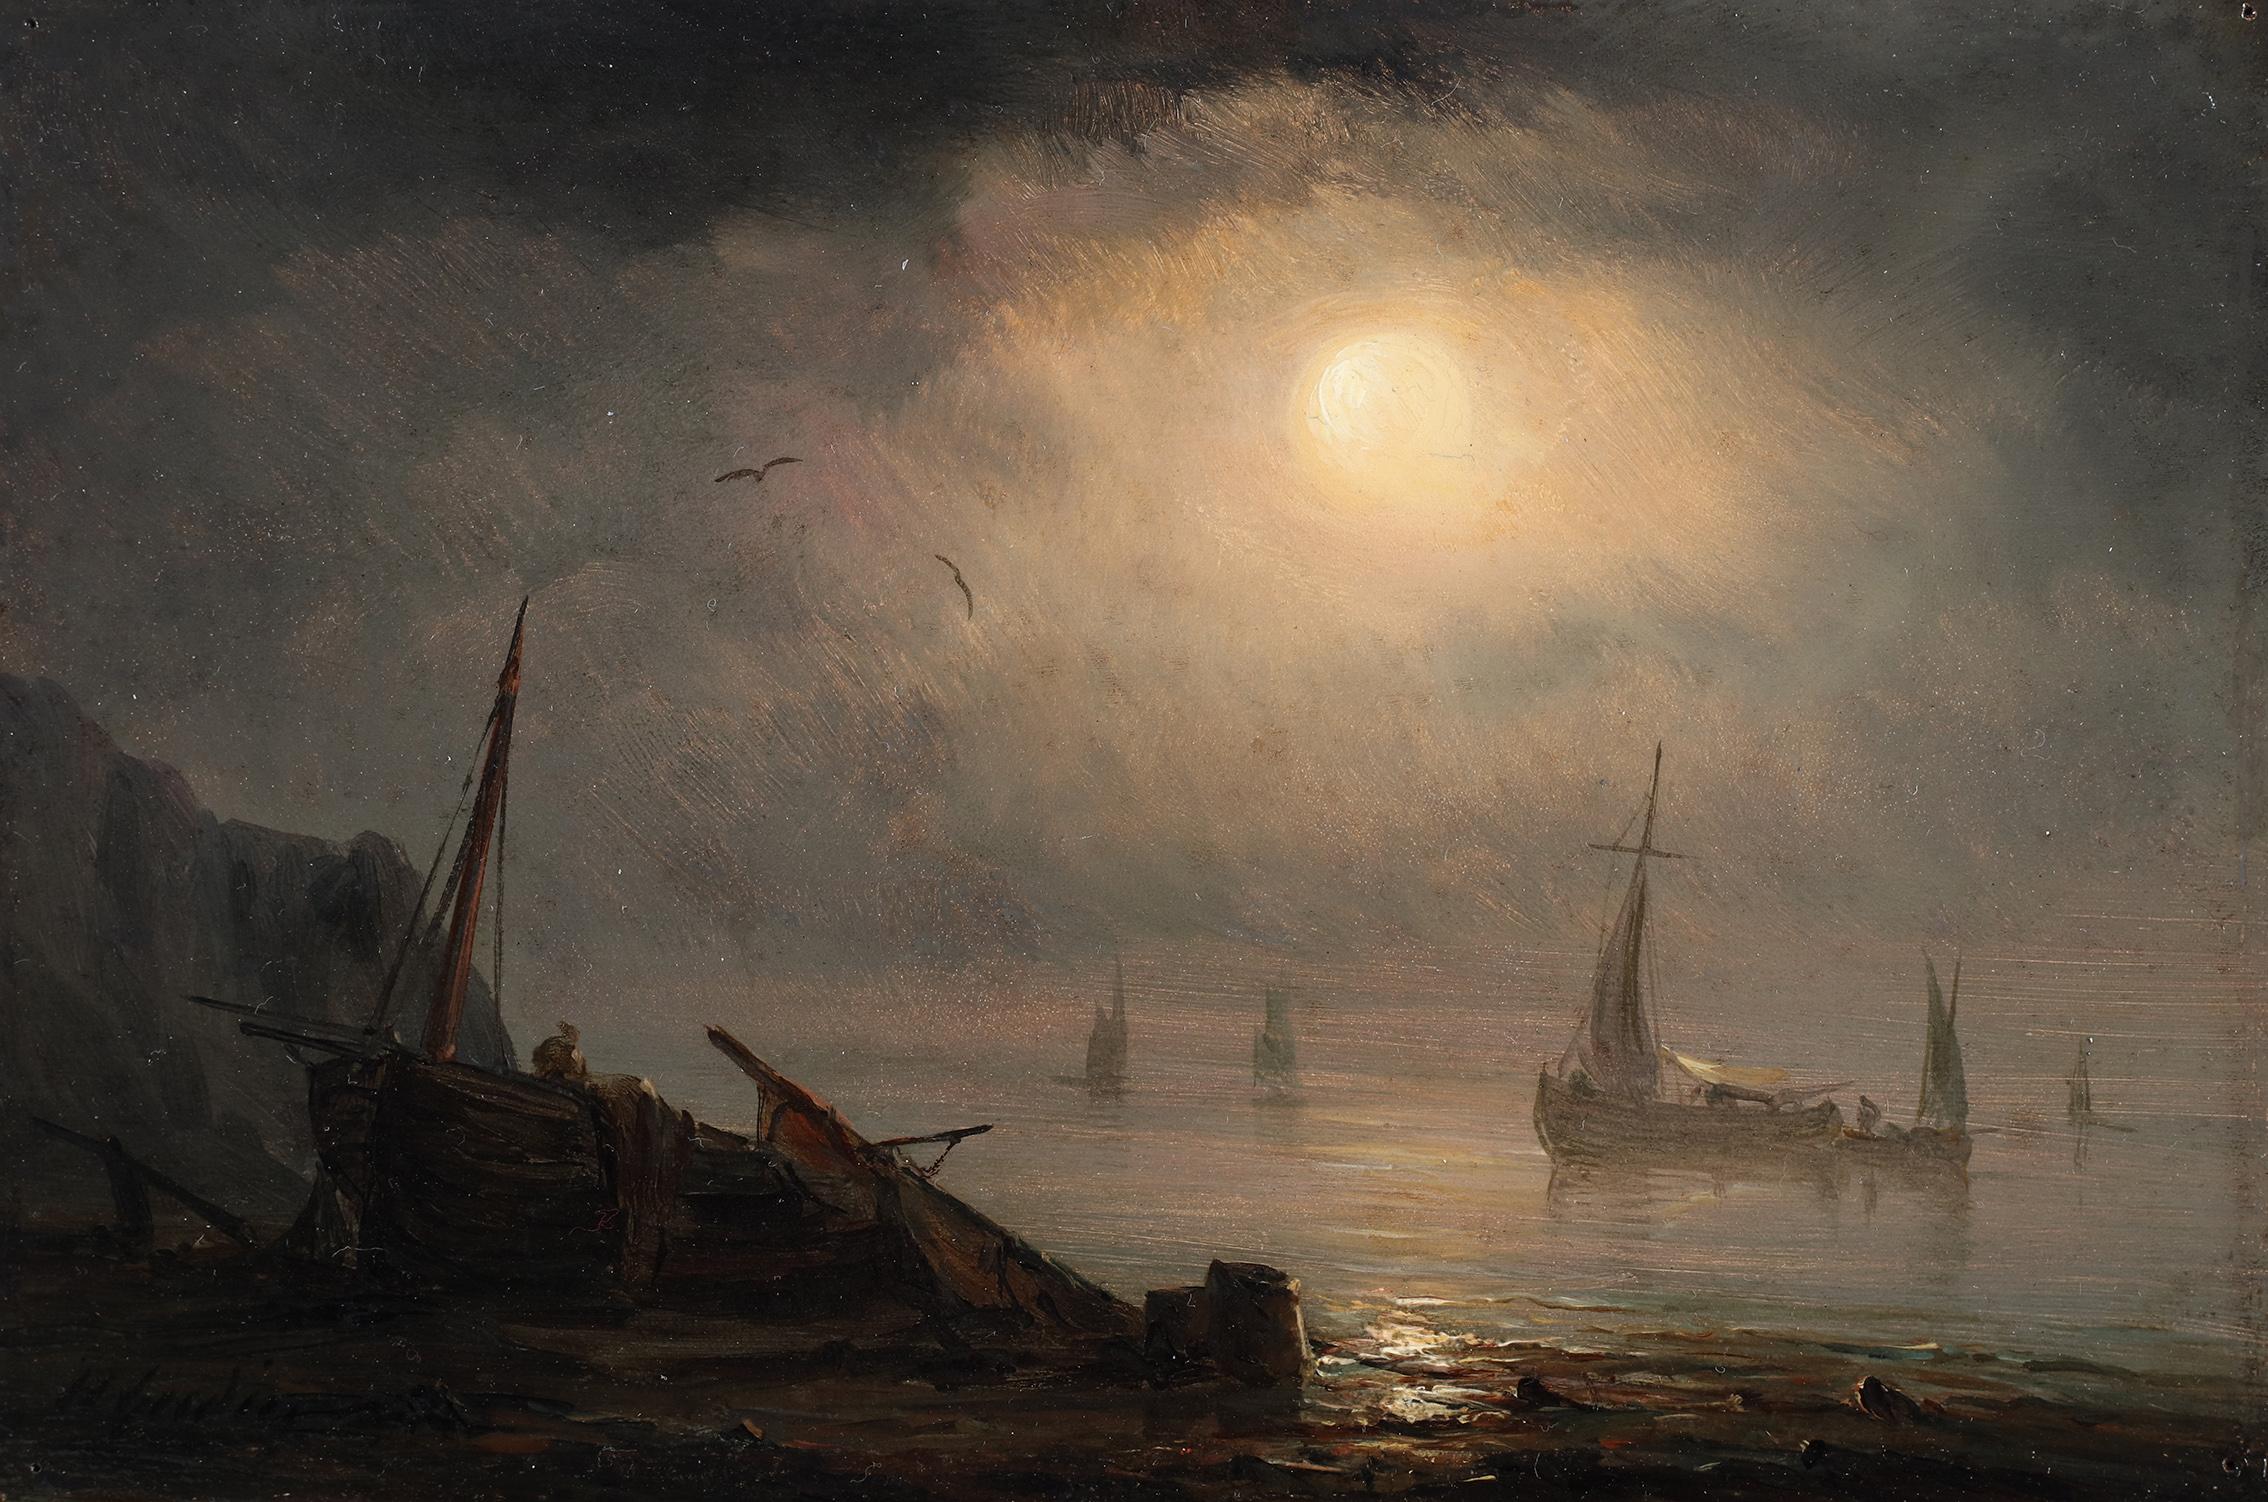 Ships near the shore under the moonlight